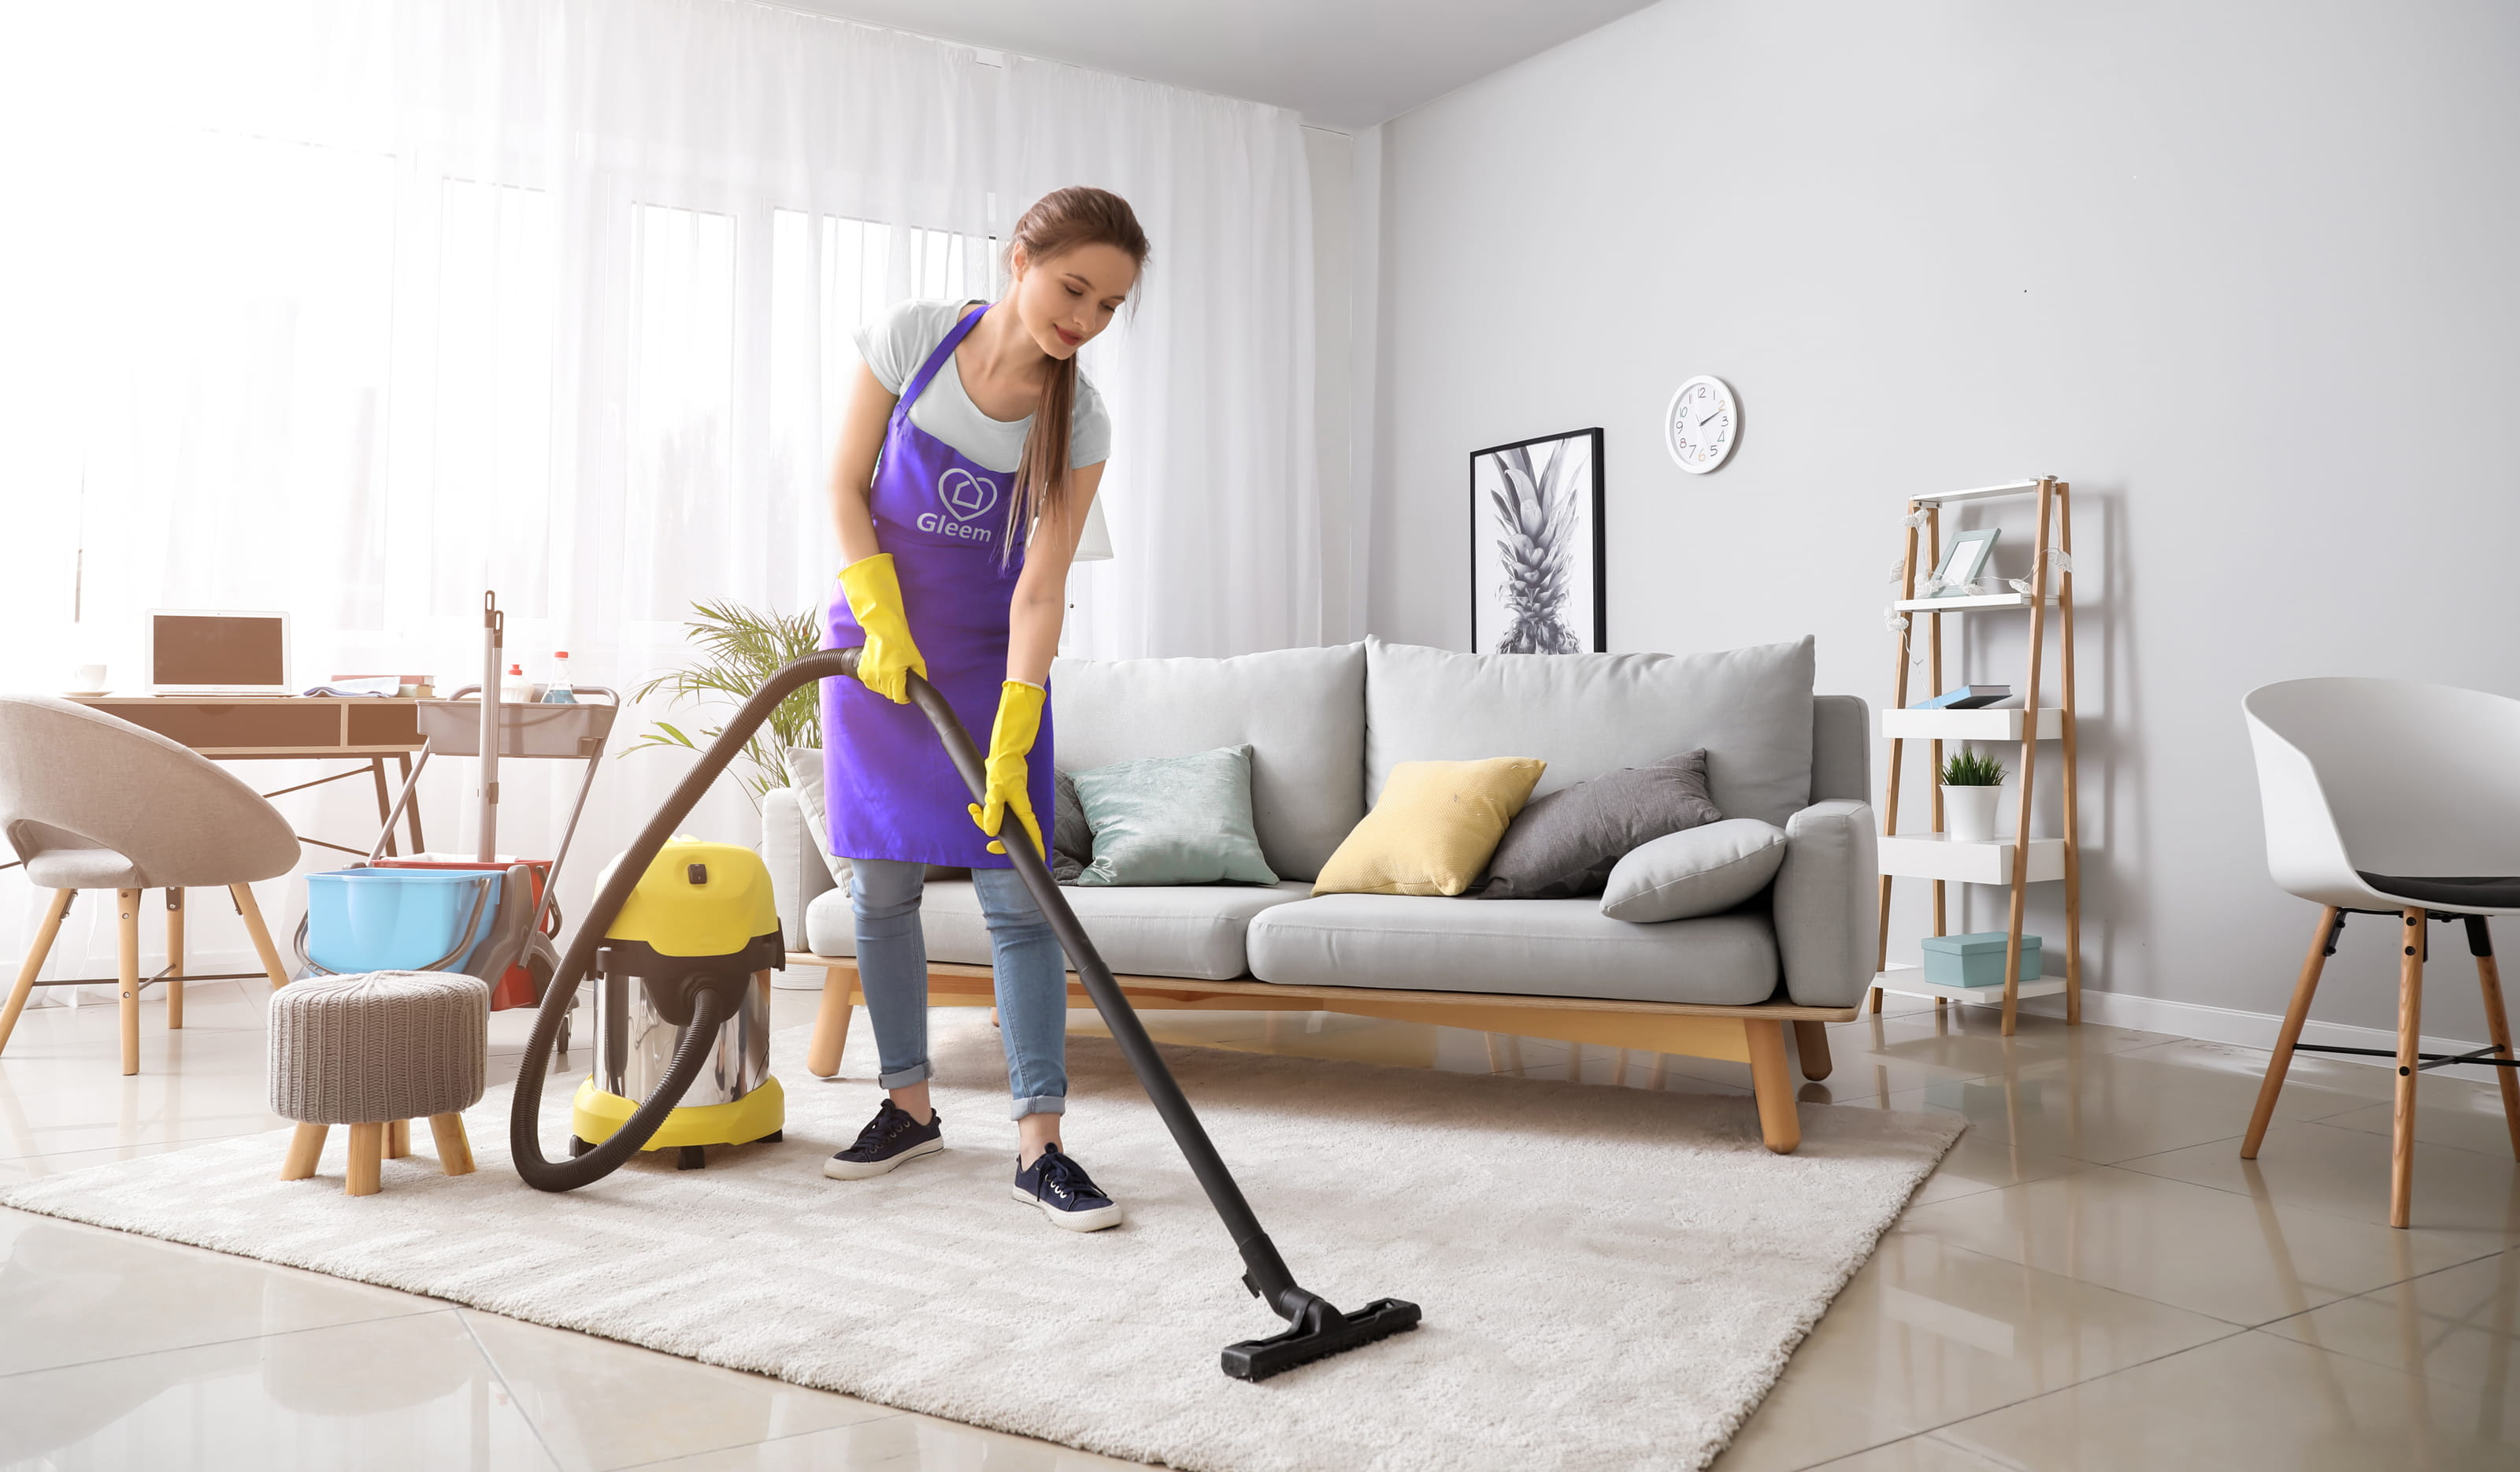 Gleem Home / House Cleaning staff member vacuums the floor carpet.